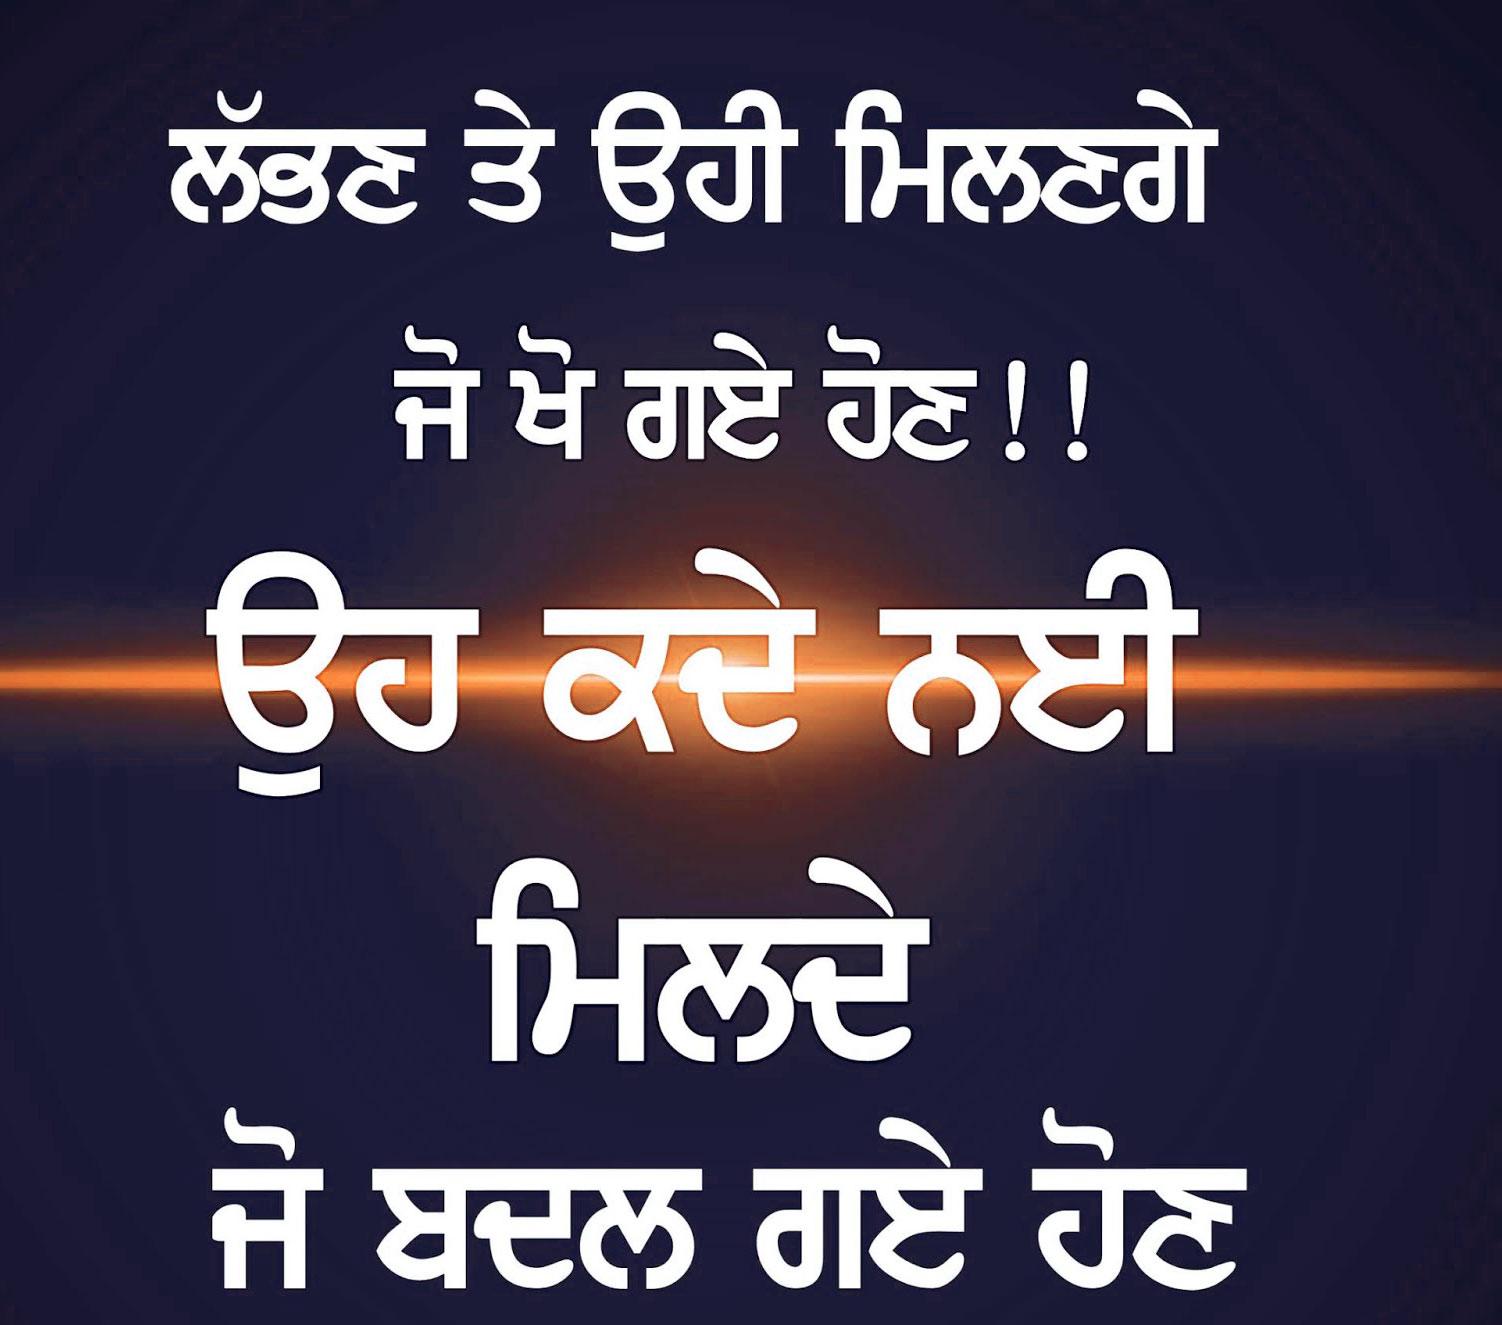 Latest HD punjabi dp Whatsapp Images